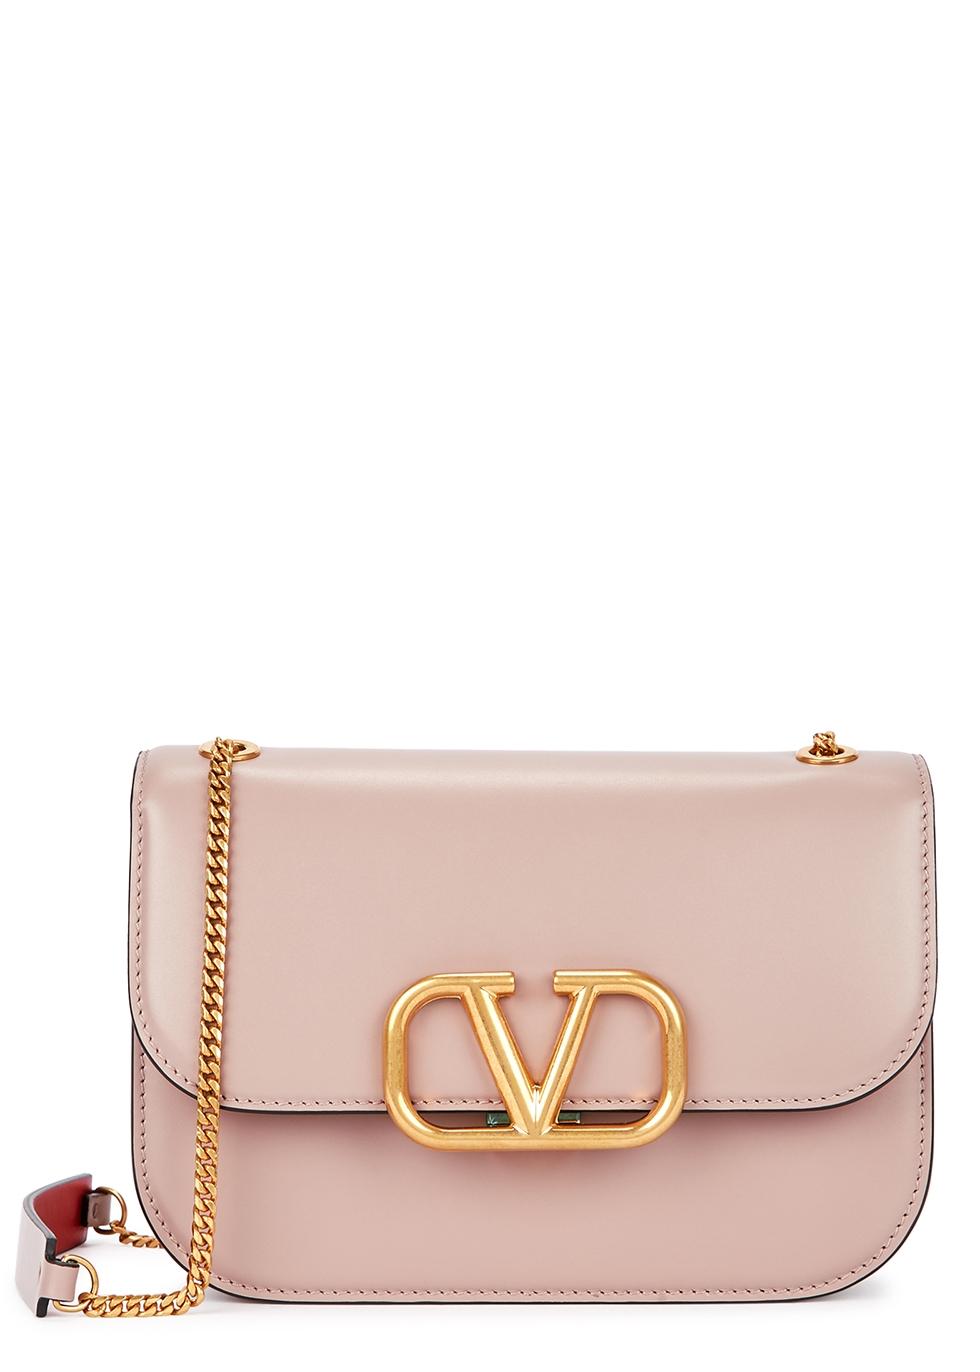 6636661079 Women's Designer Bags, Handbags and Purses - Harvey Nichols